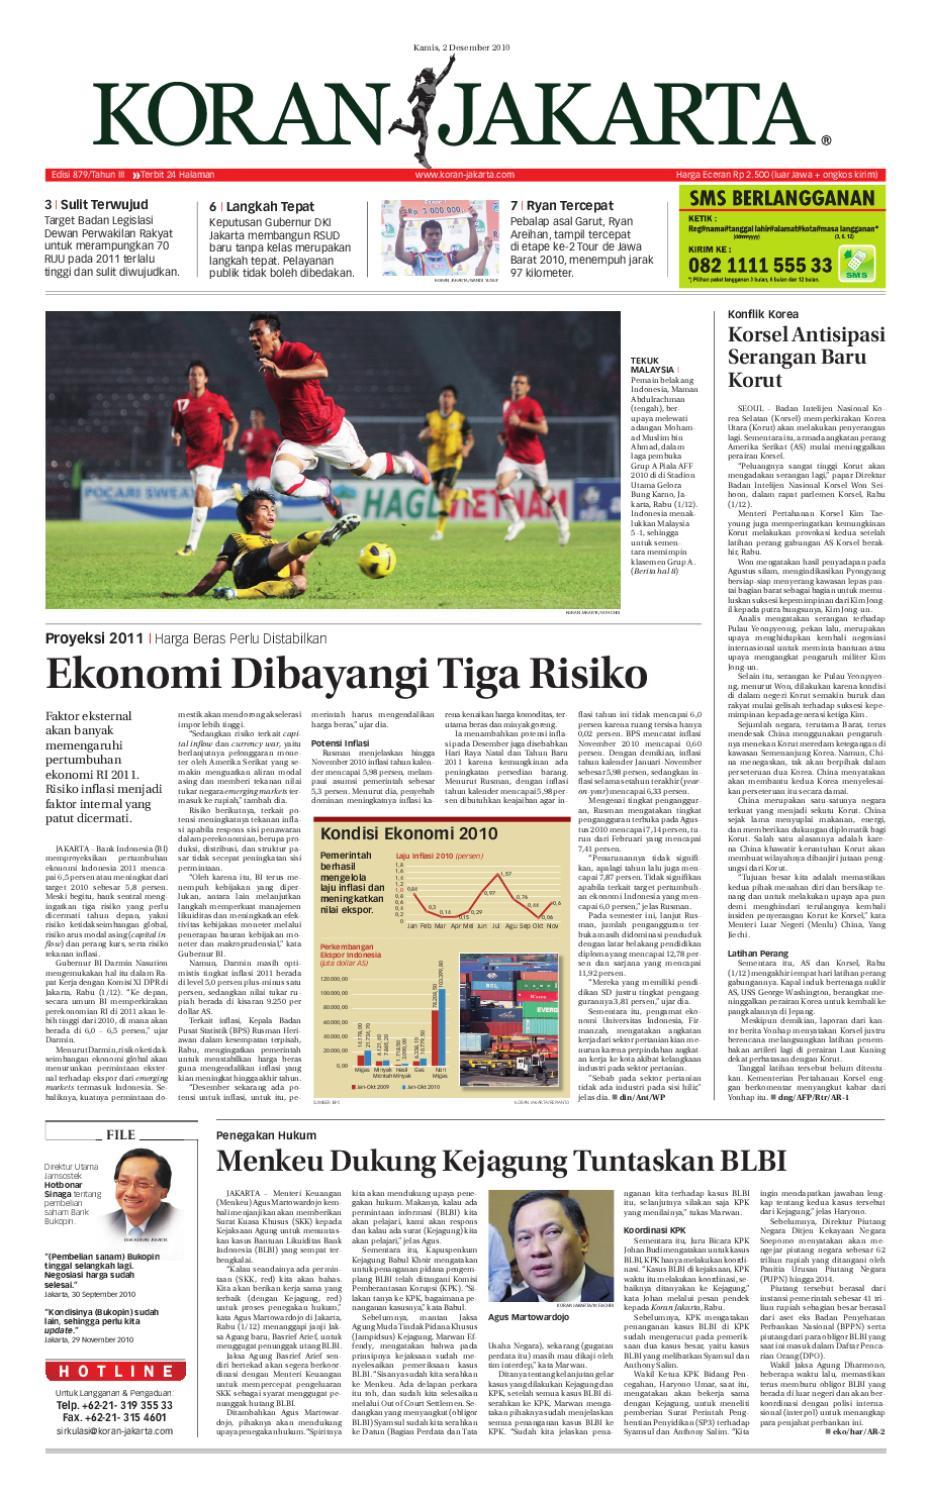 Edisi 879 2 Desember 2010 By Pt Berita Nusantara Issuu Tcash Vaganza 37 Kran Tembok Kuningan Tr 5j F